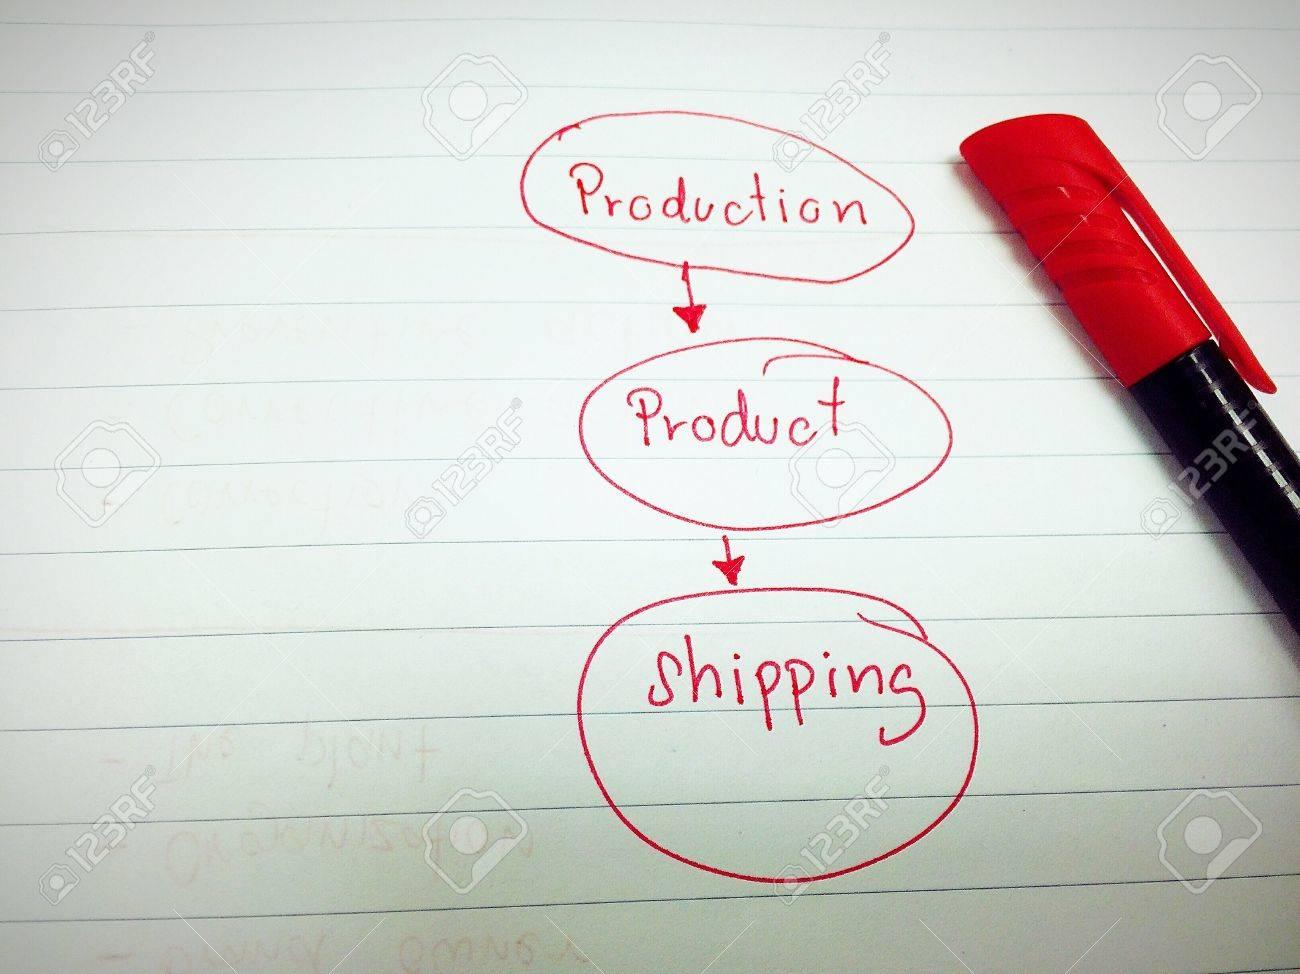 manufacturing process flow